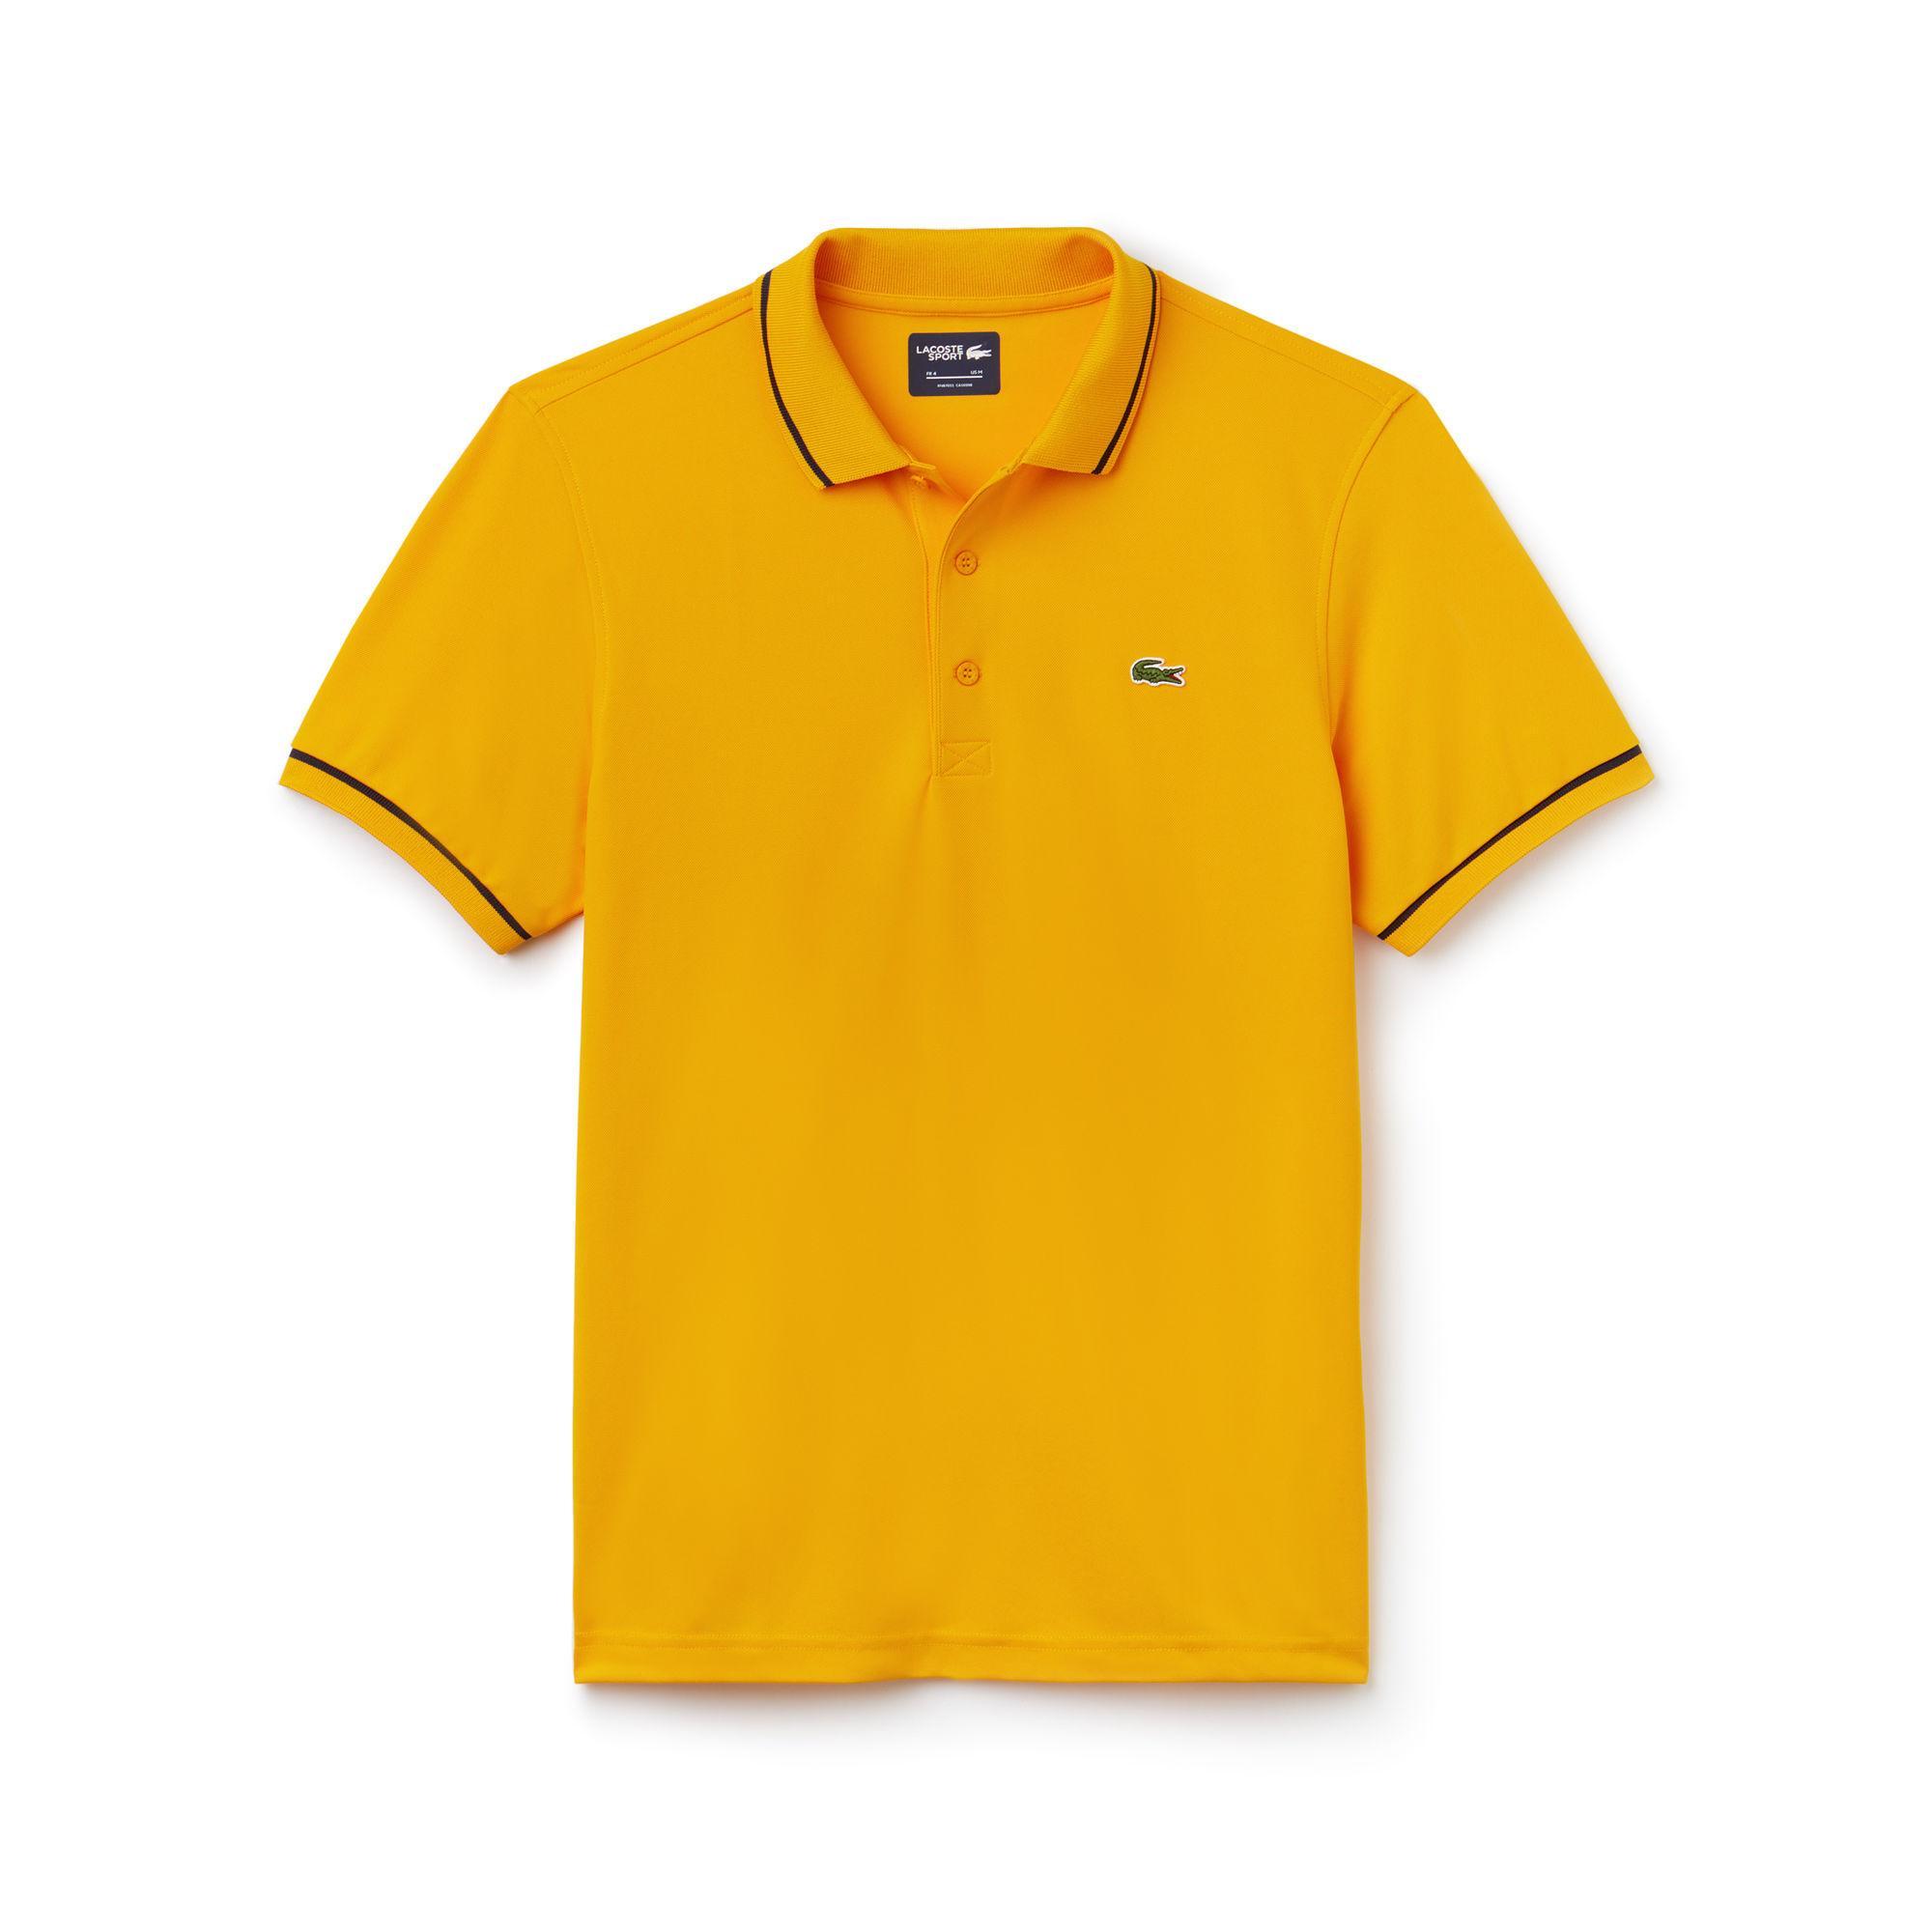 4bdfd127 Lacoste. Men's Yellow Sport Tennis Piped Technical Piqué Polo Shirt